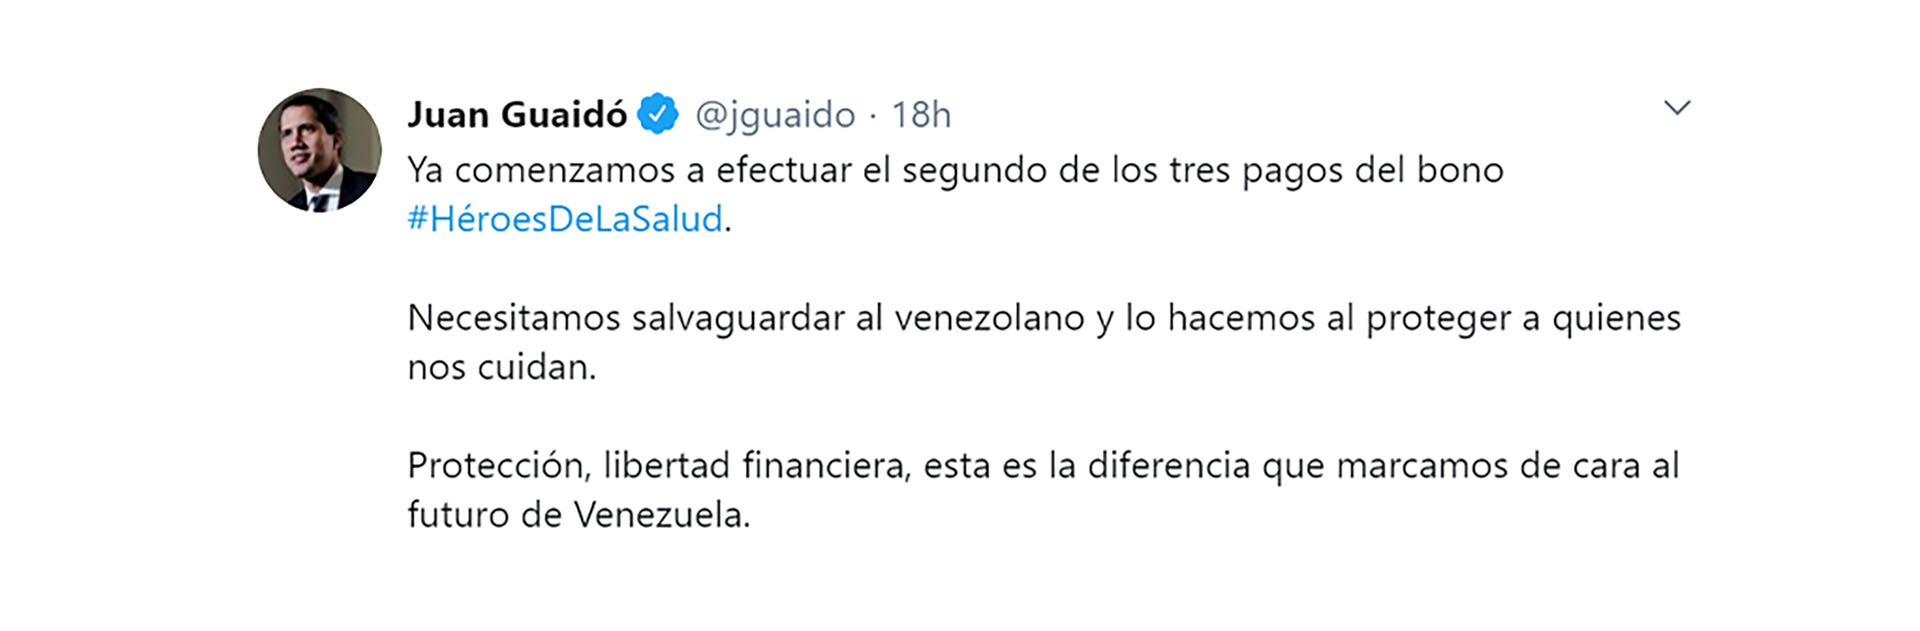 El anuncio de Guaidó en Twitter